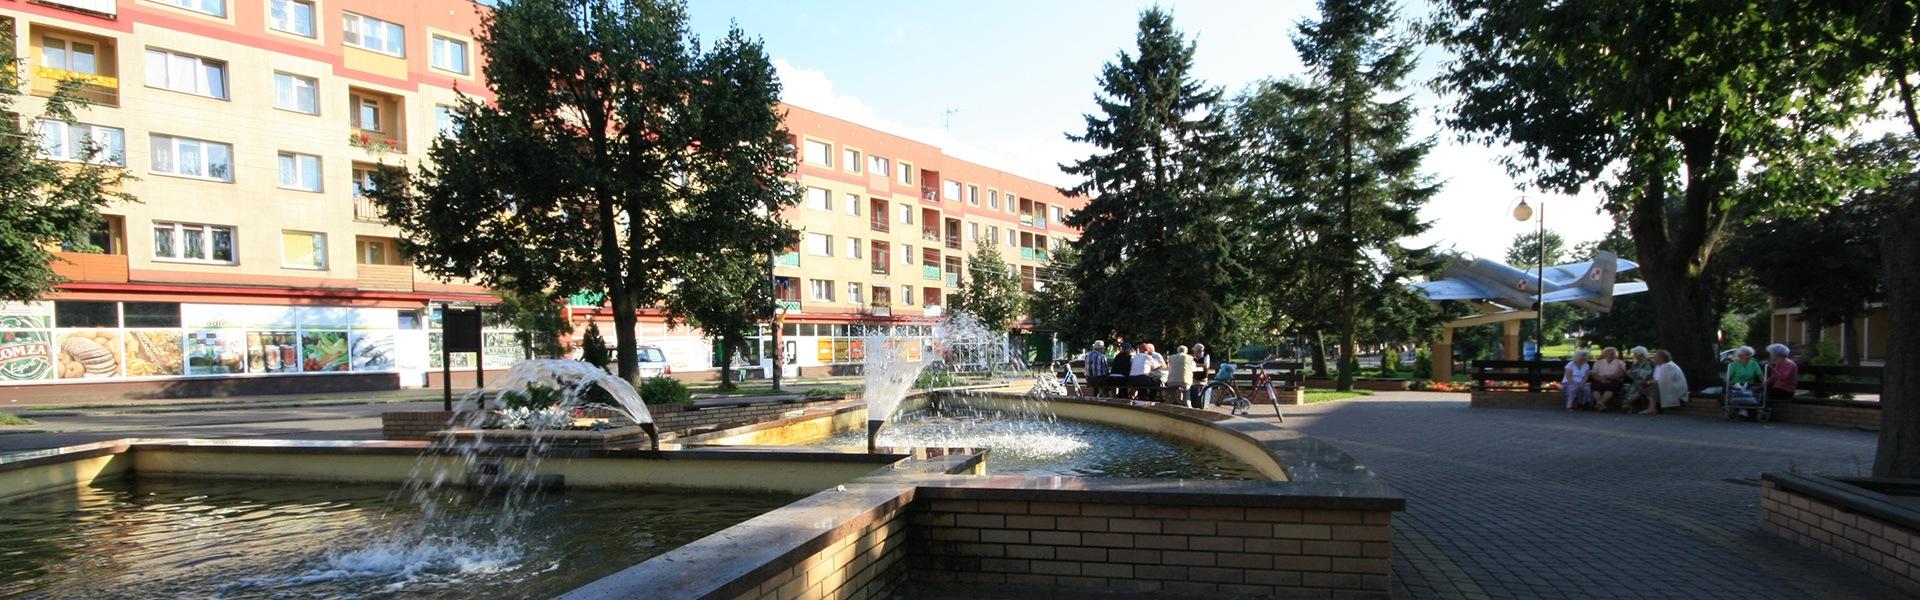 monki fontanna